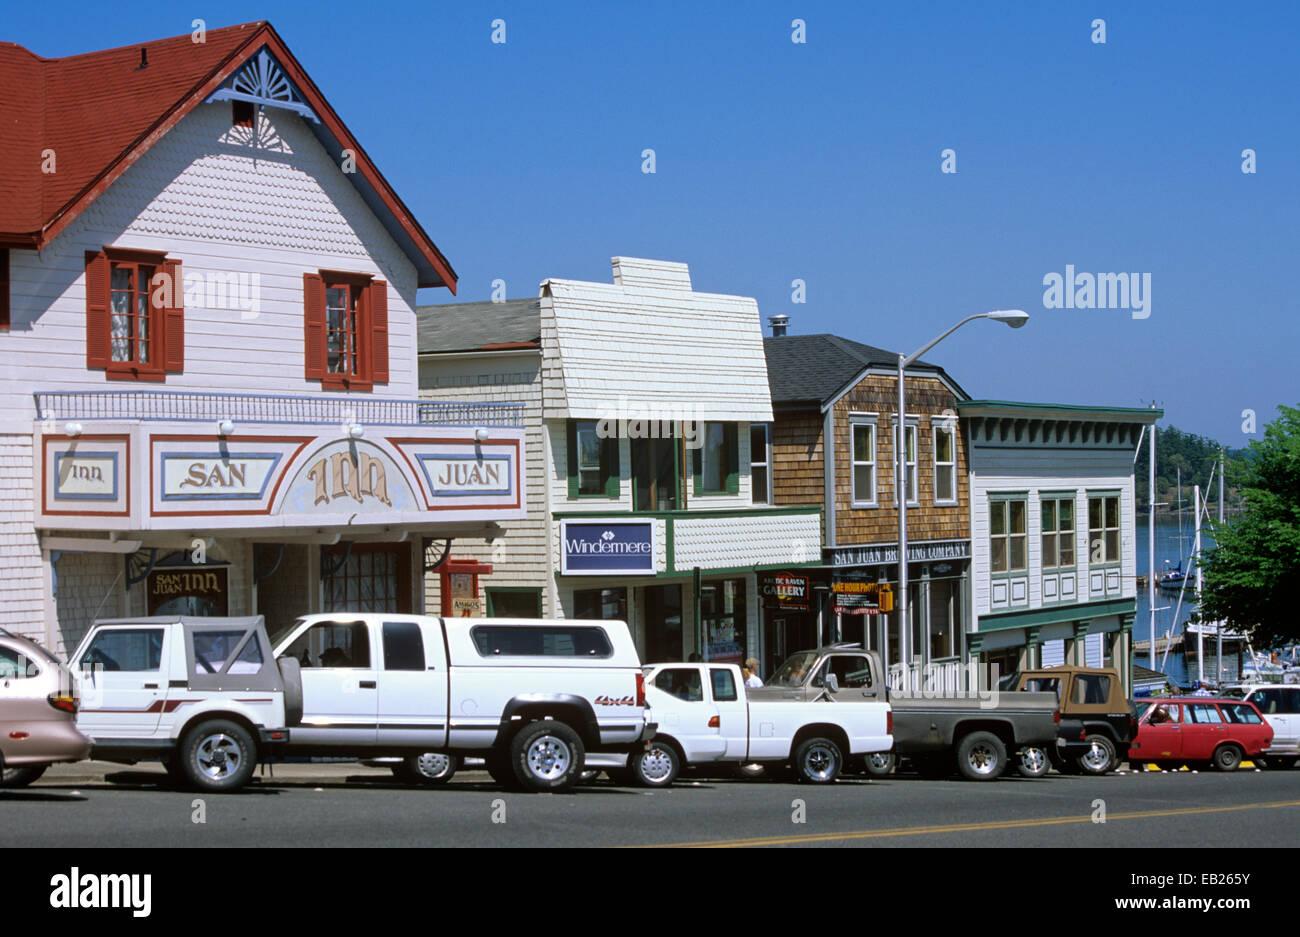 San Juan Island is a popular resort destination, centered around the town of Friday Harbor, Washington, USA - Stock Image